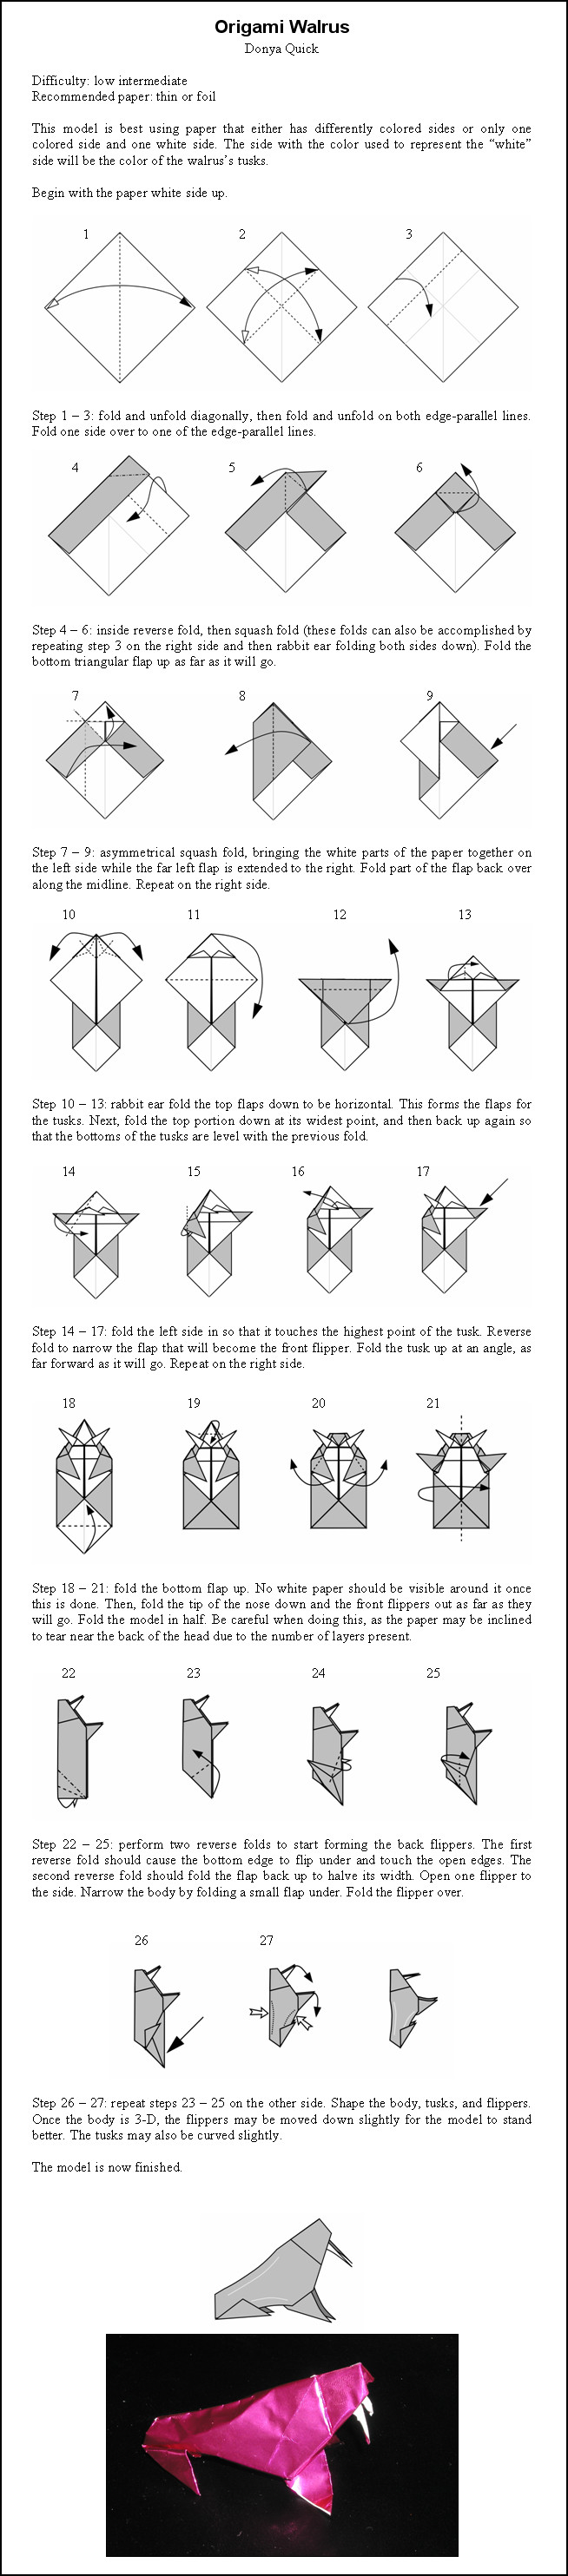 Group of Origami Walru...